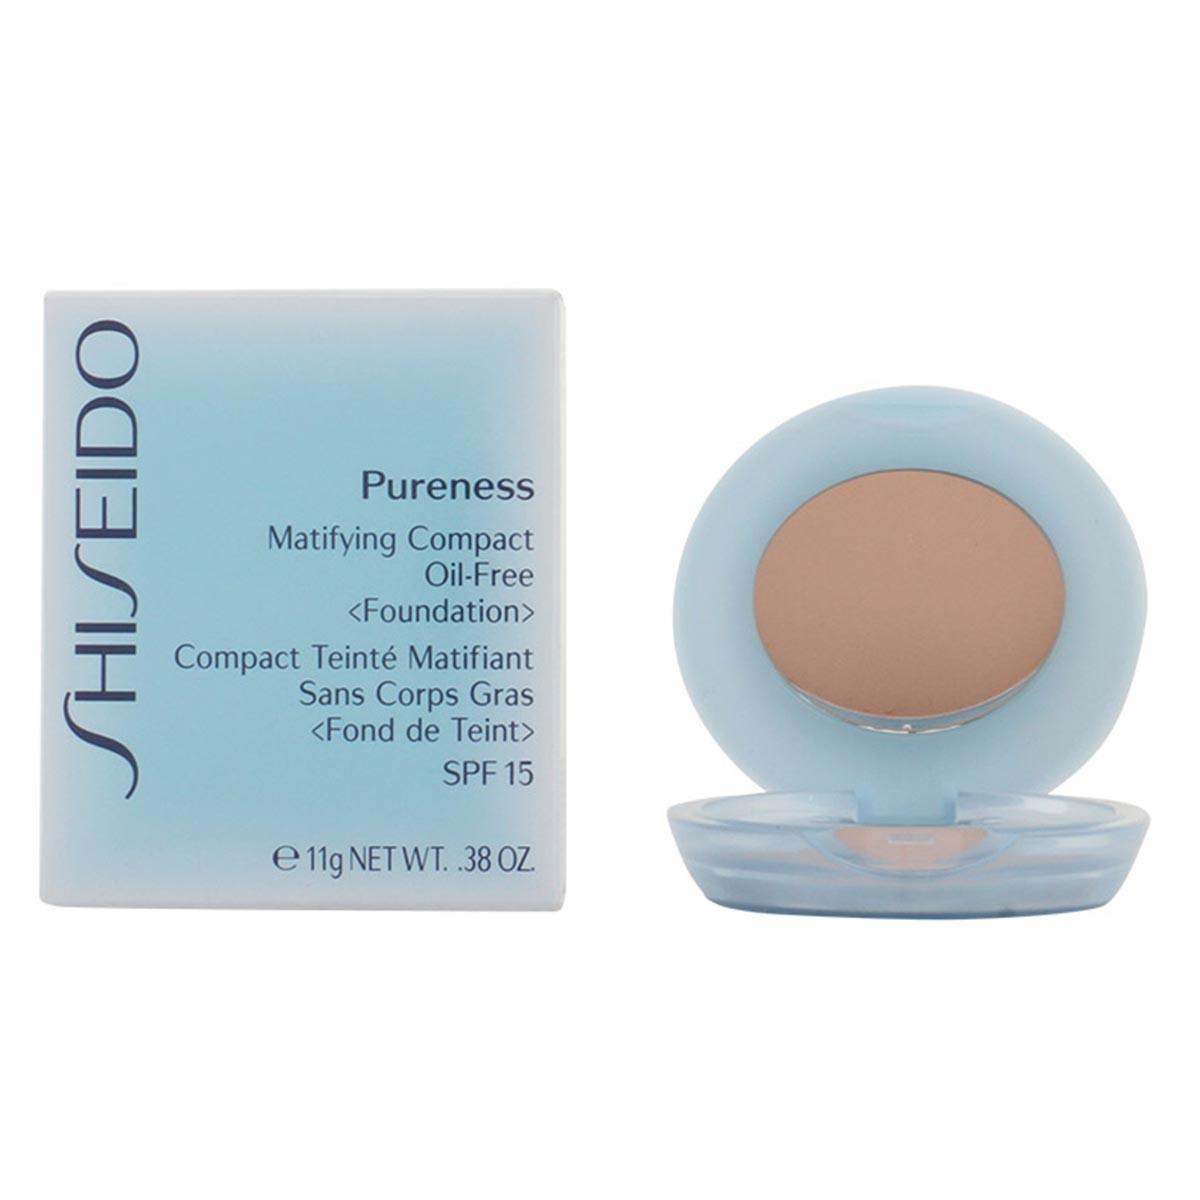 Shiseido pureness matifying compact oil free 20 light beige